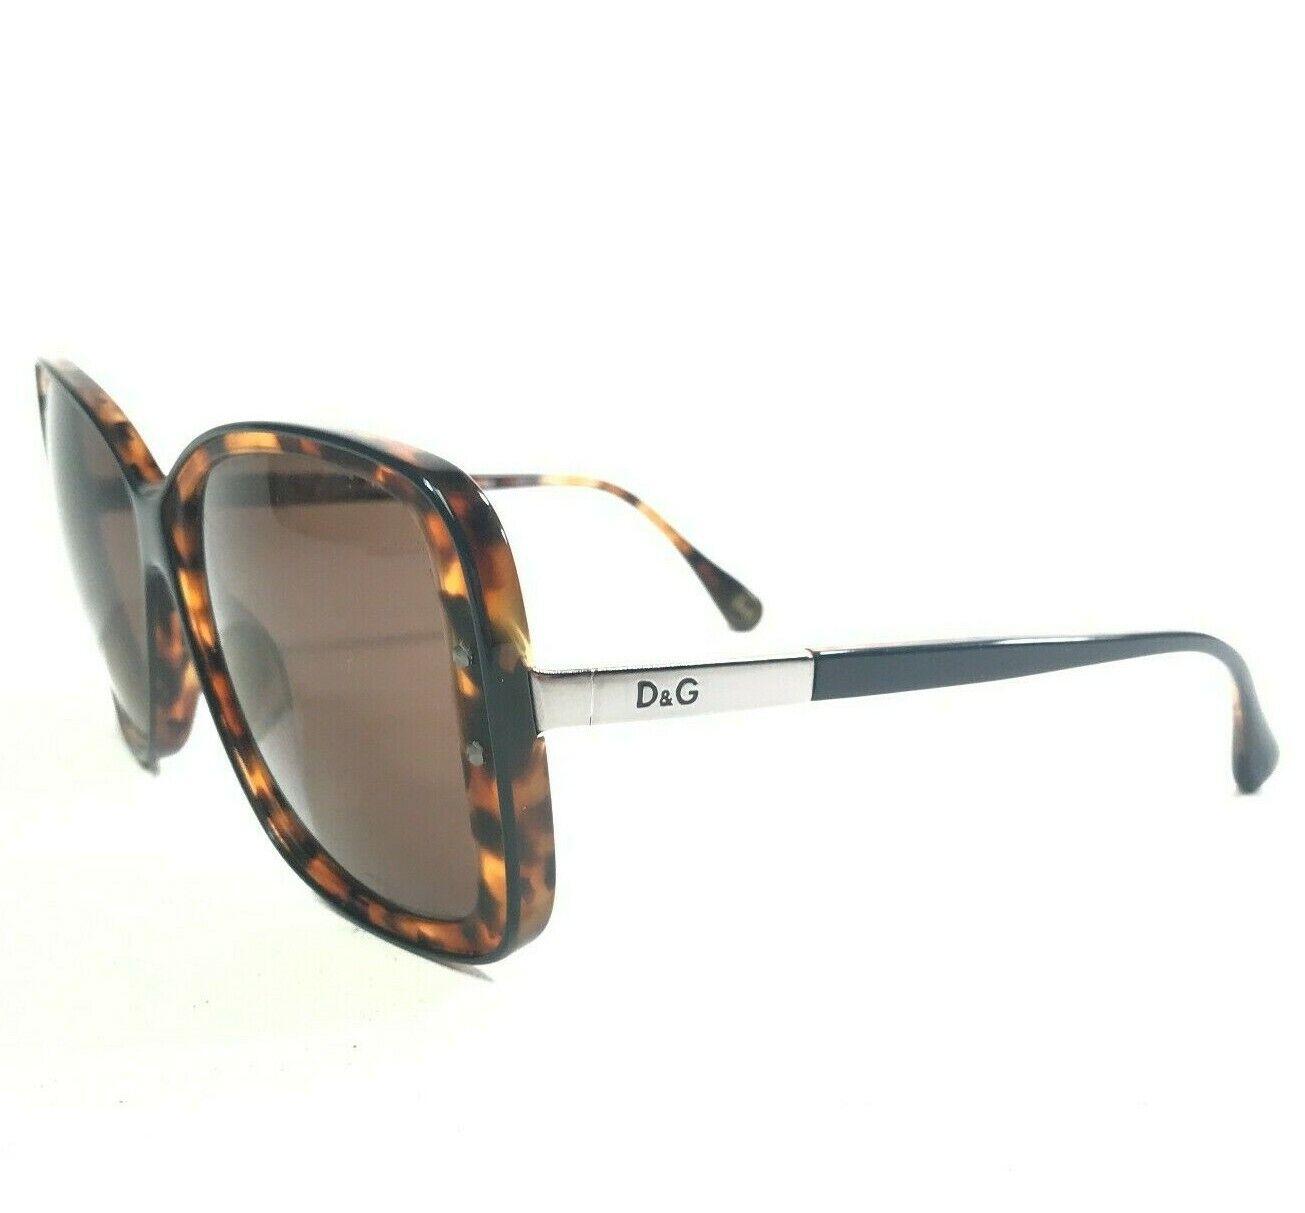 Dolce & Gabbana Sunglasses D&G3078 1979/73 Tortoise Gray Oversize Butterfly 135